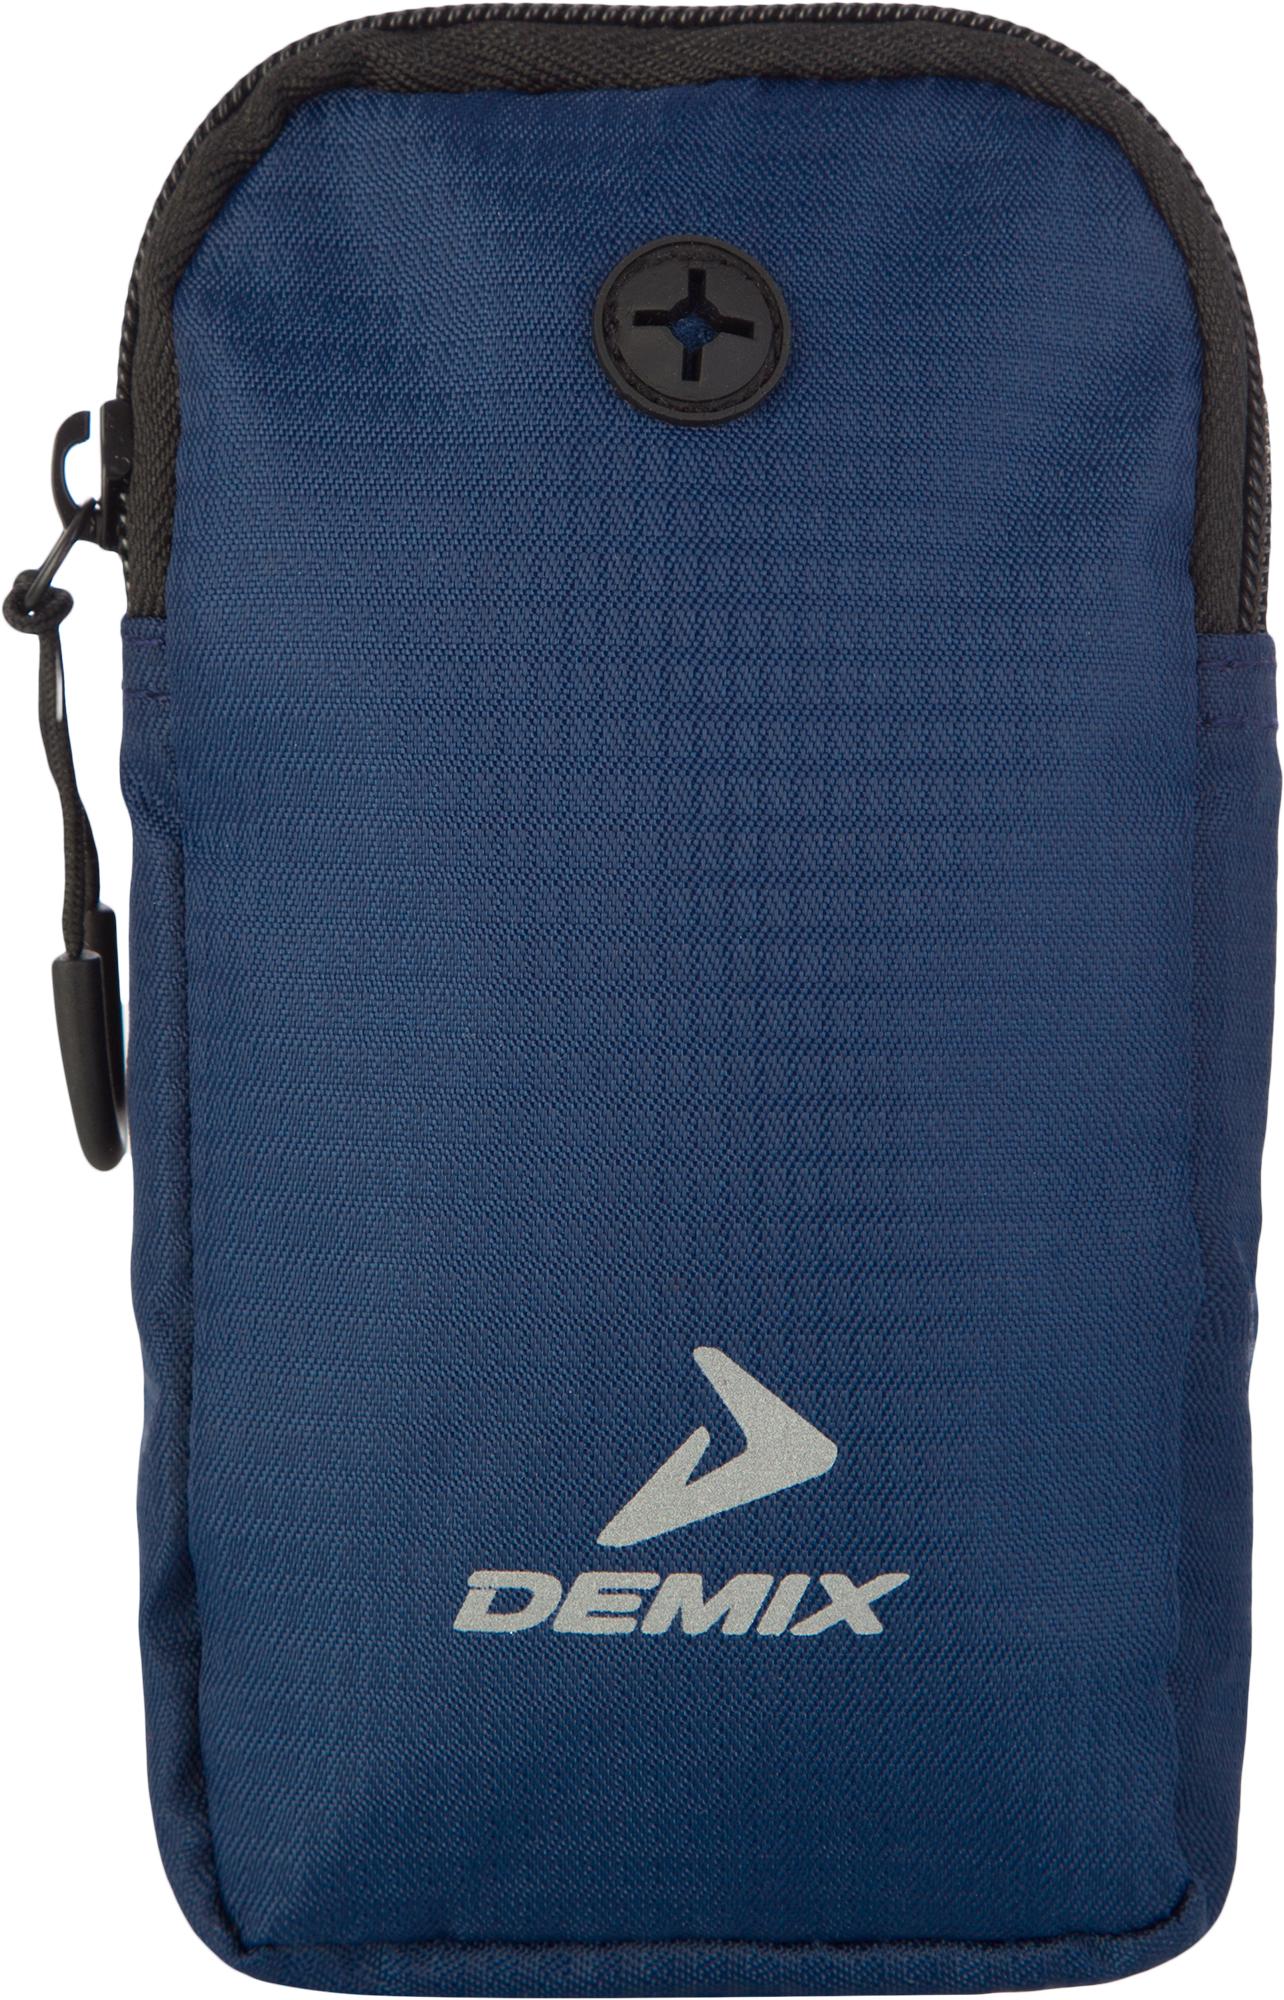 Demix Чехол на руку для смартфона